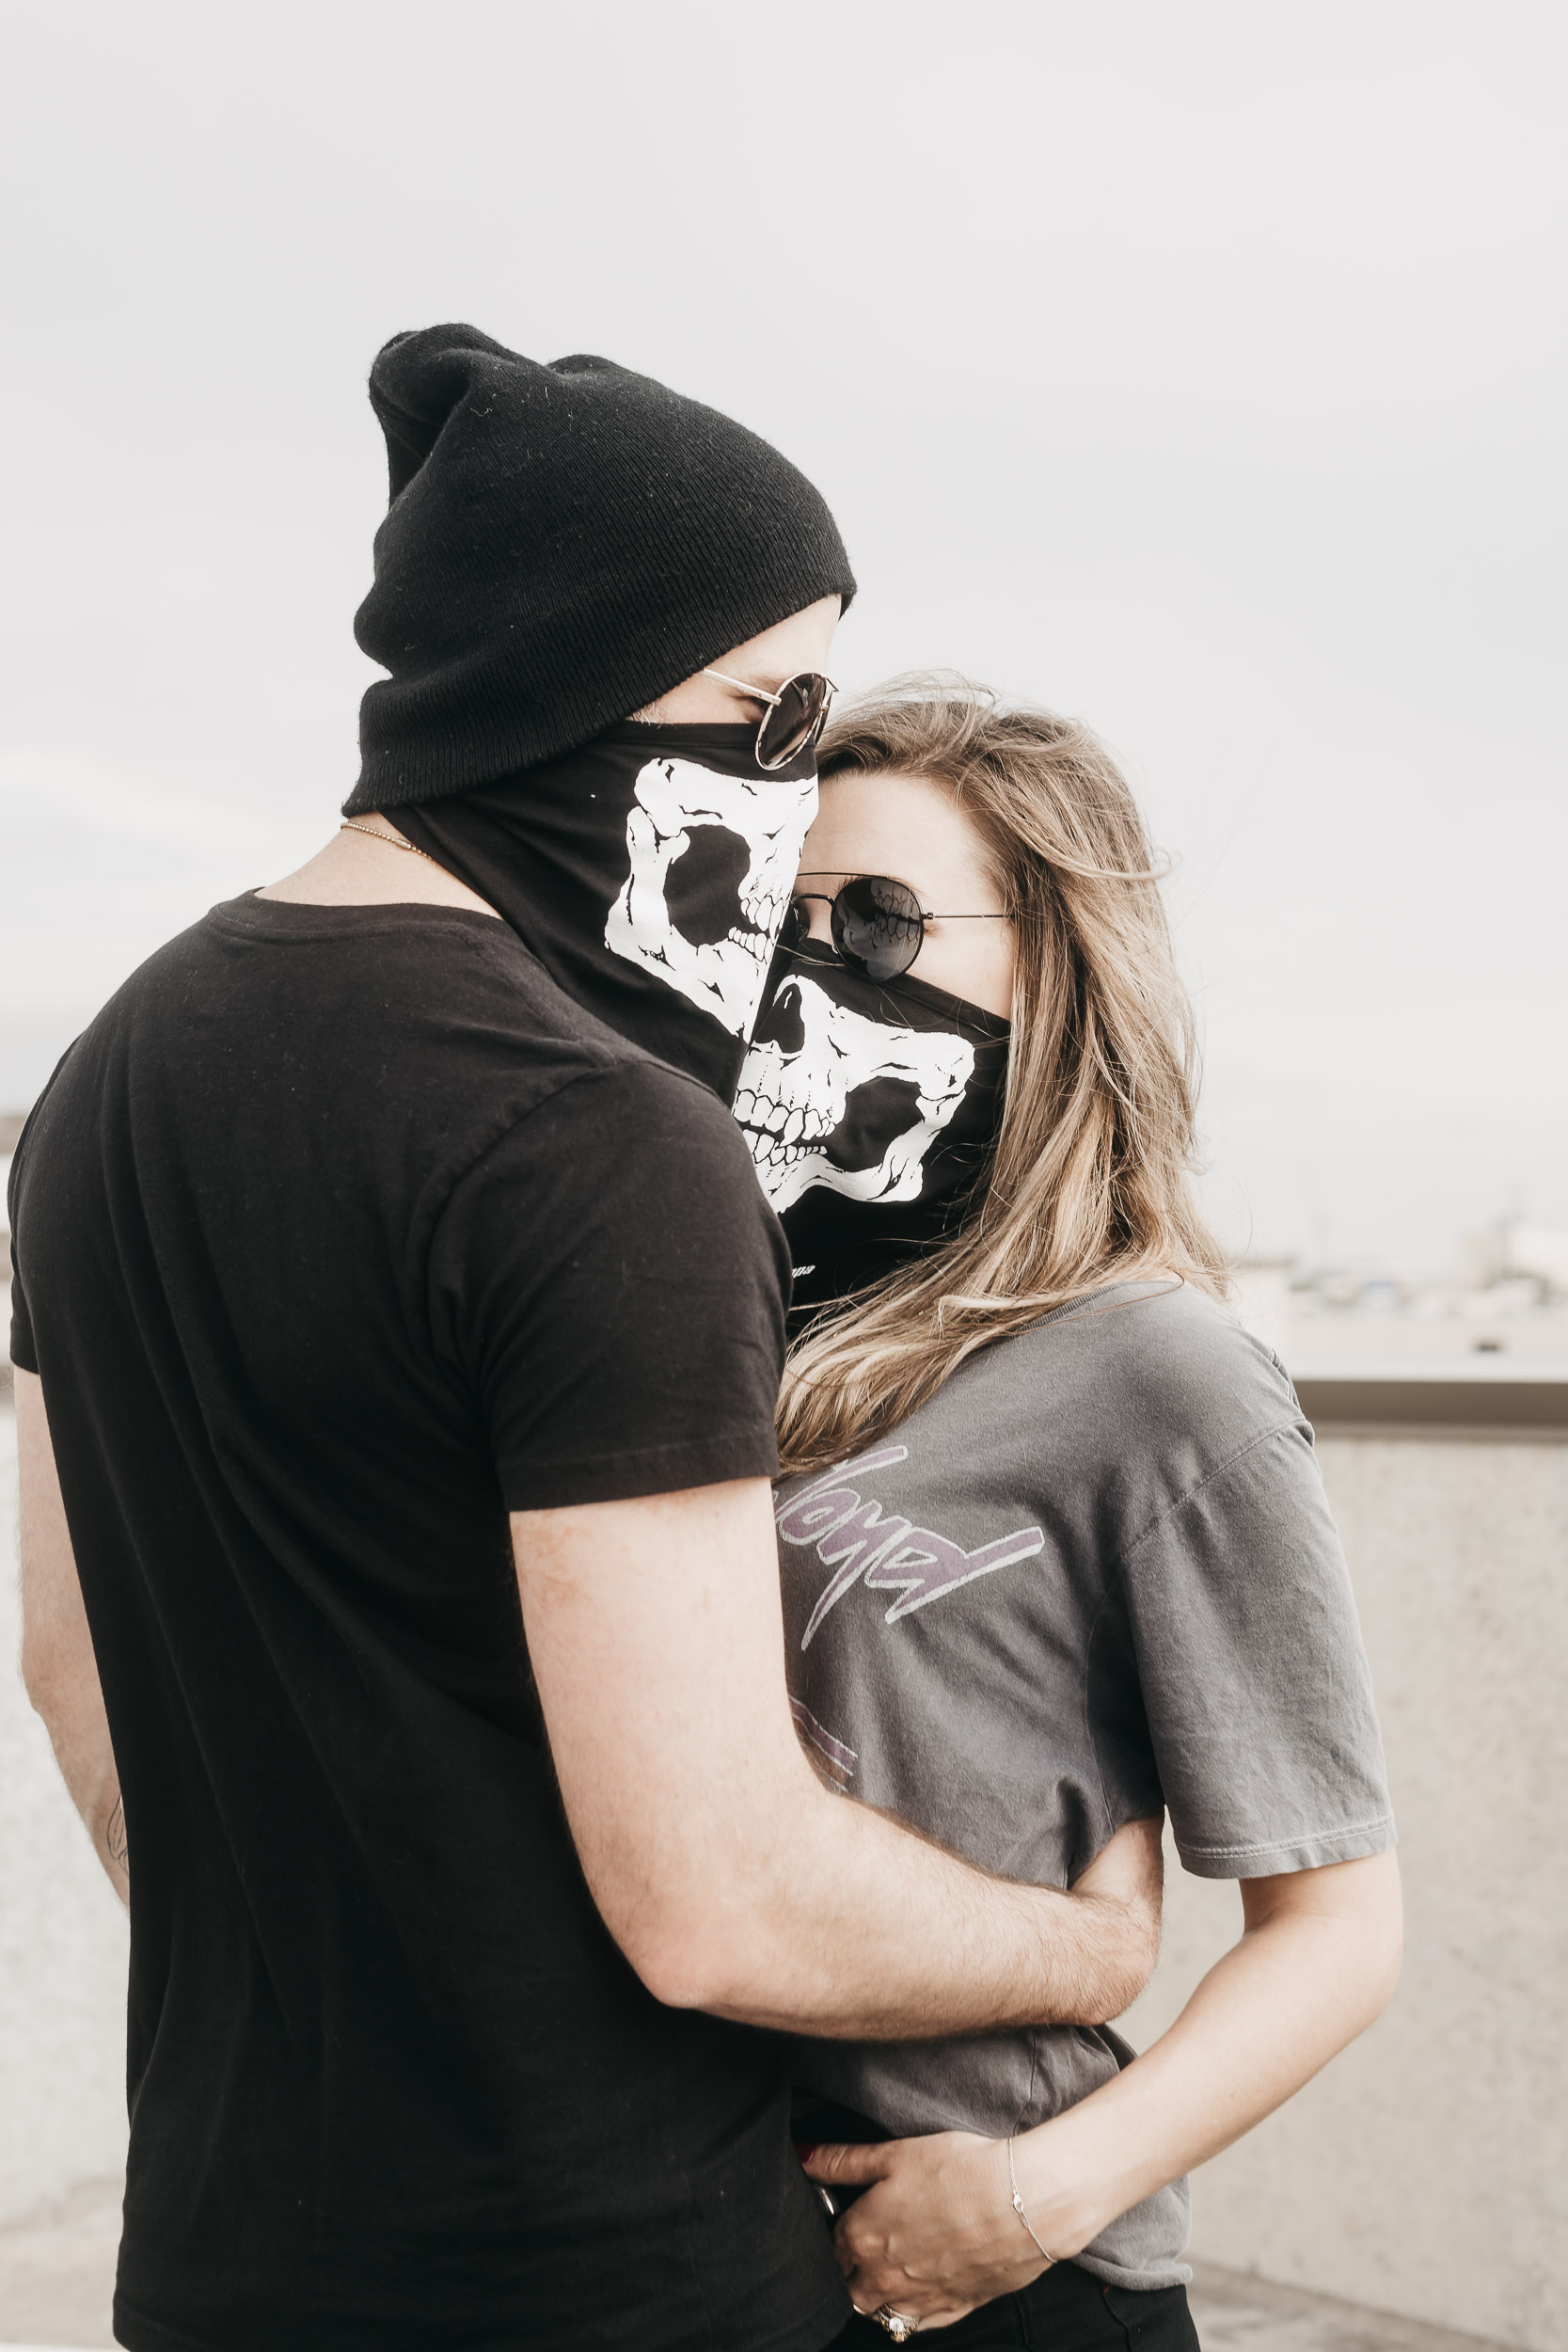 Orlando-Elopement-Engagement-Photographer-21.jpg